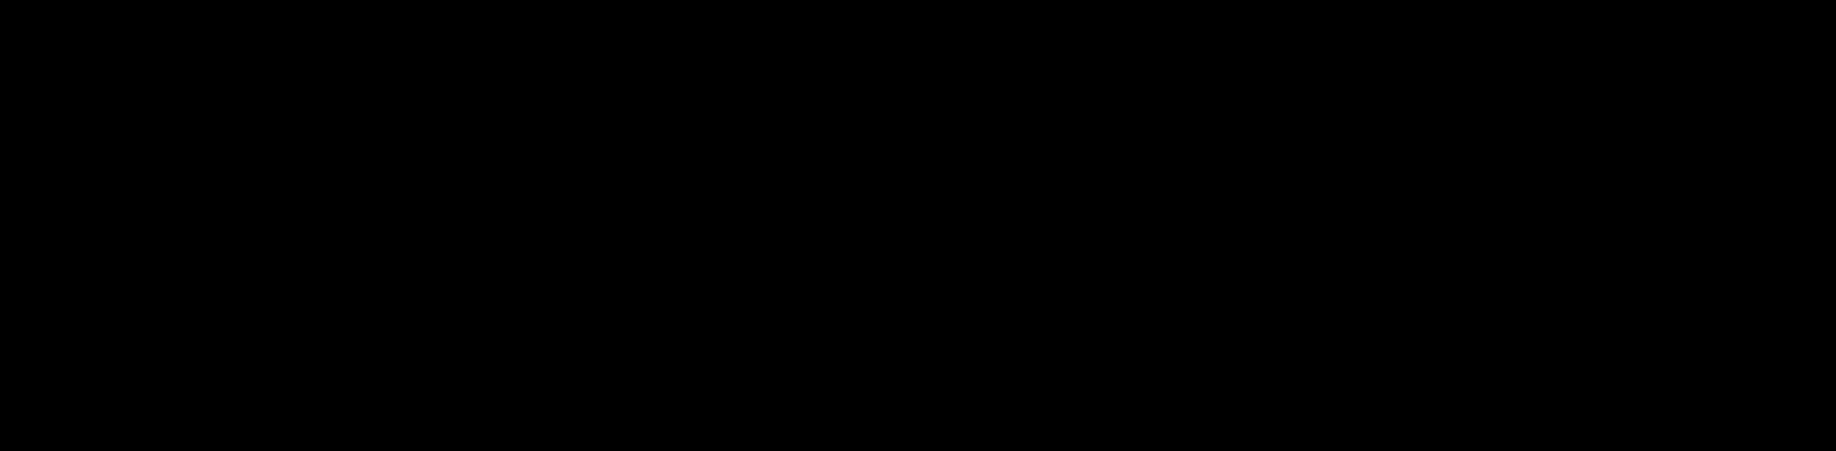 mk-logo